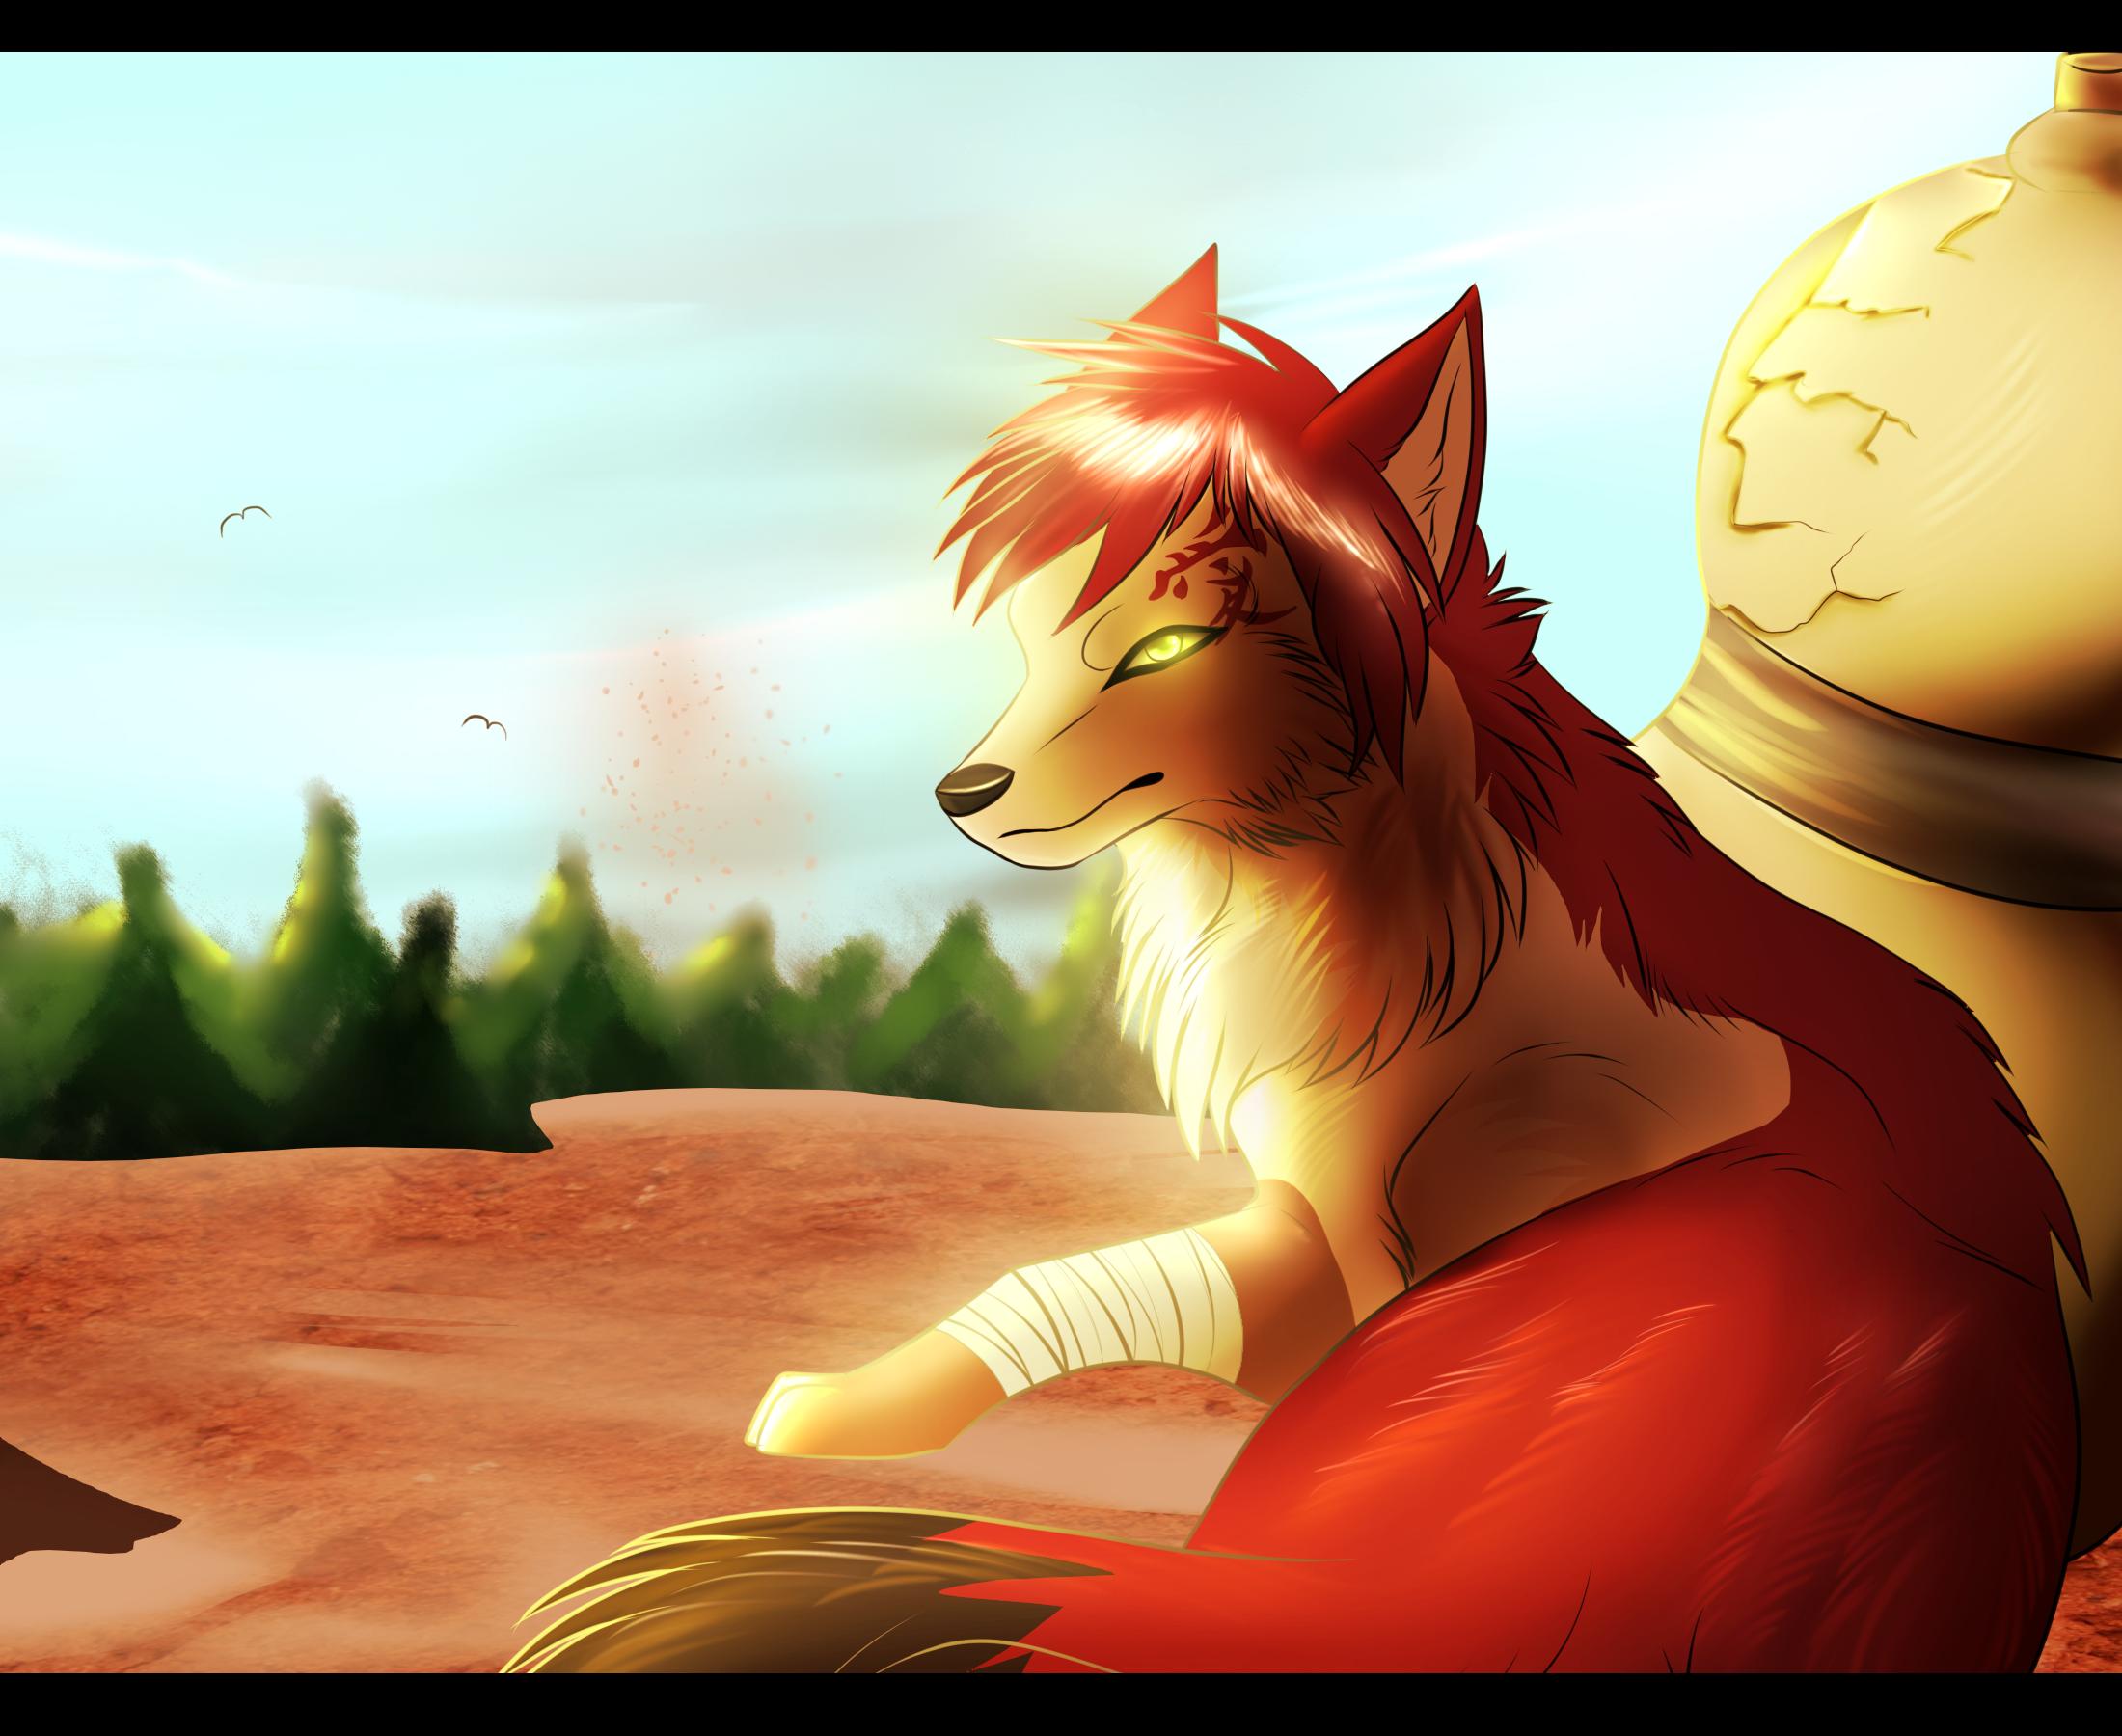 Gaara Wolf by Shiinrai on DeviantArt Gaara As A Wolf